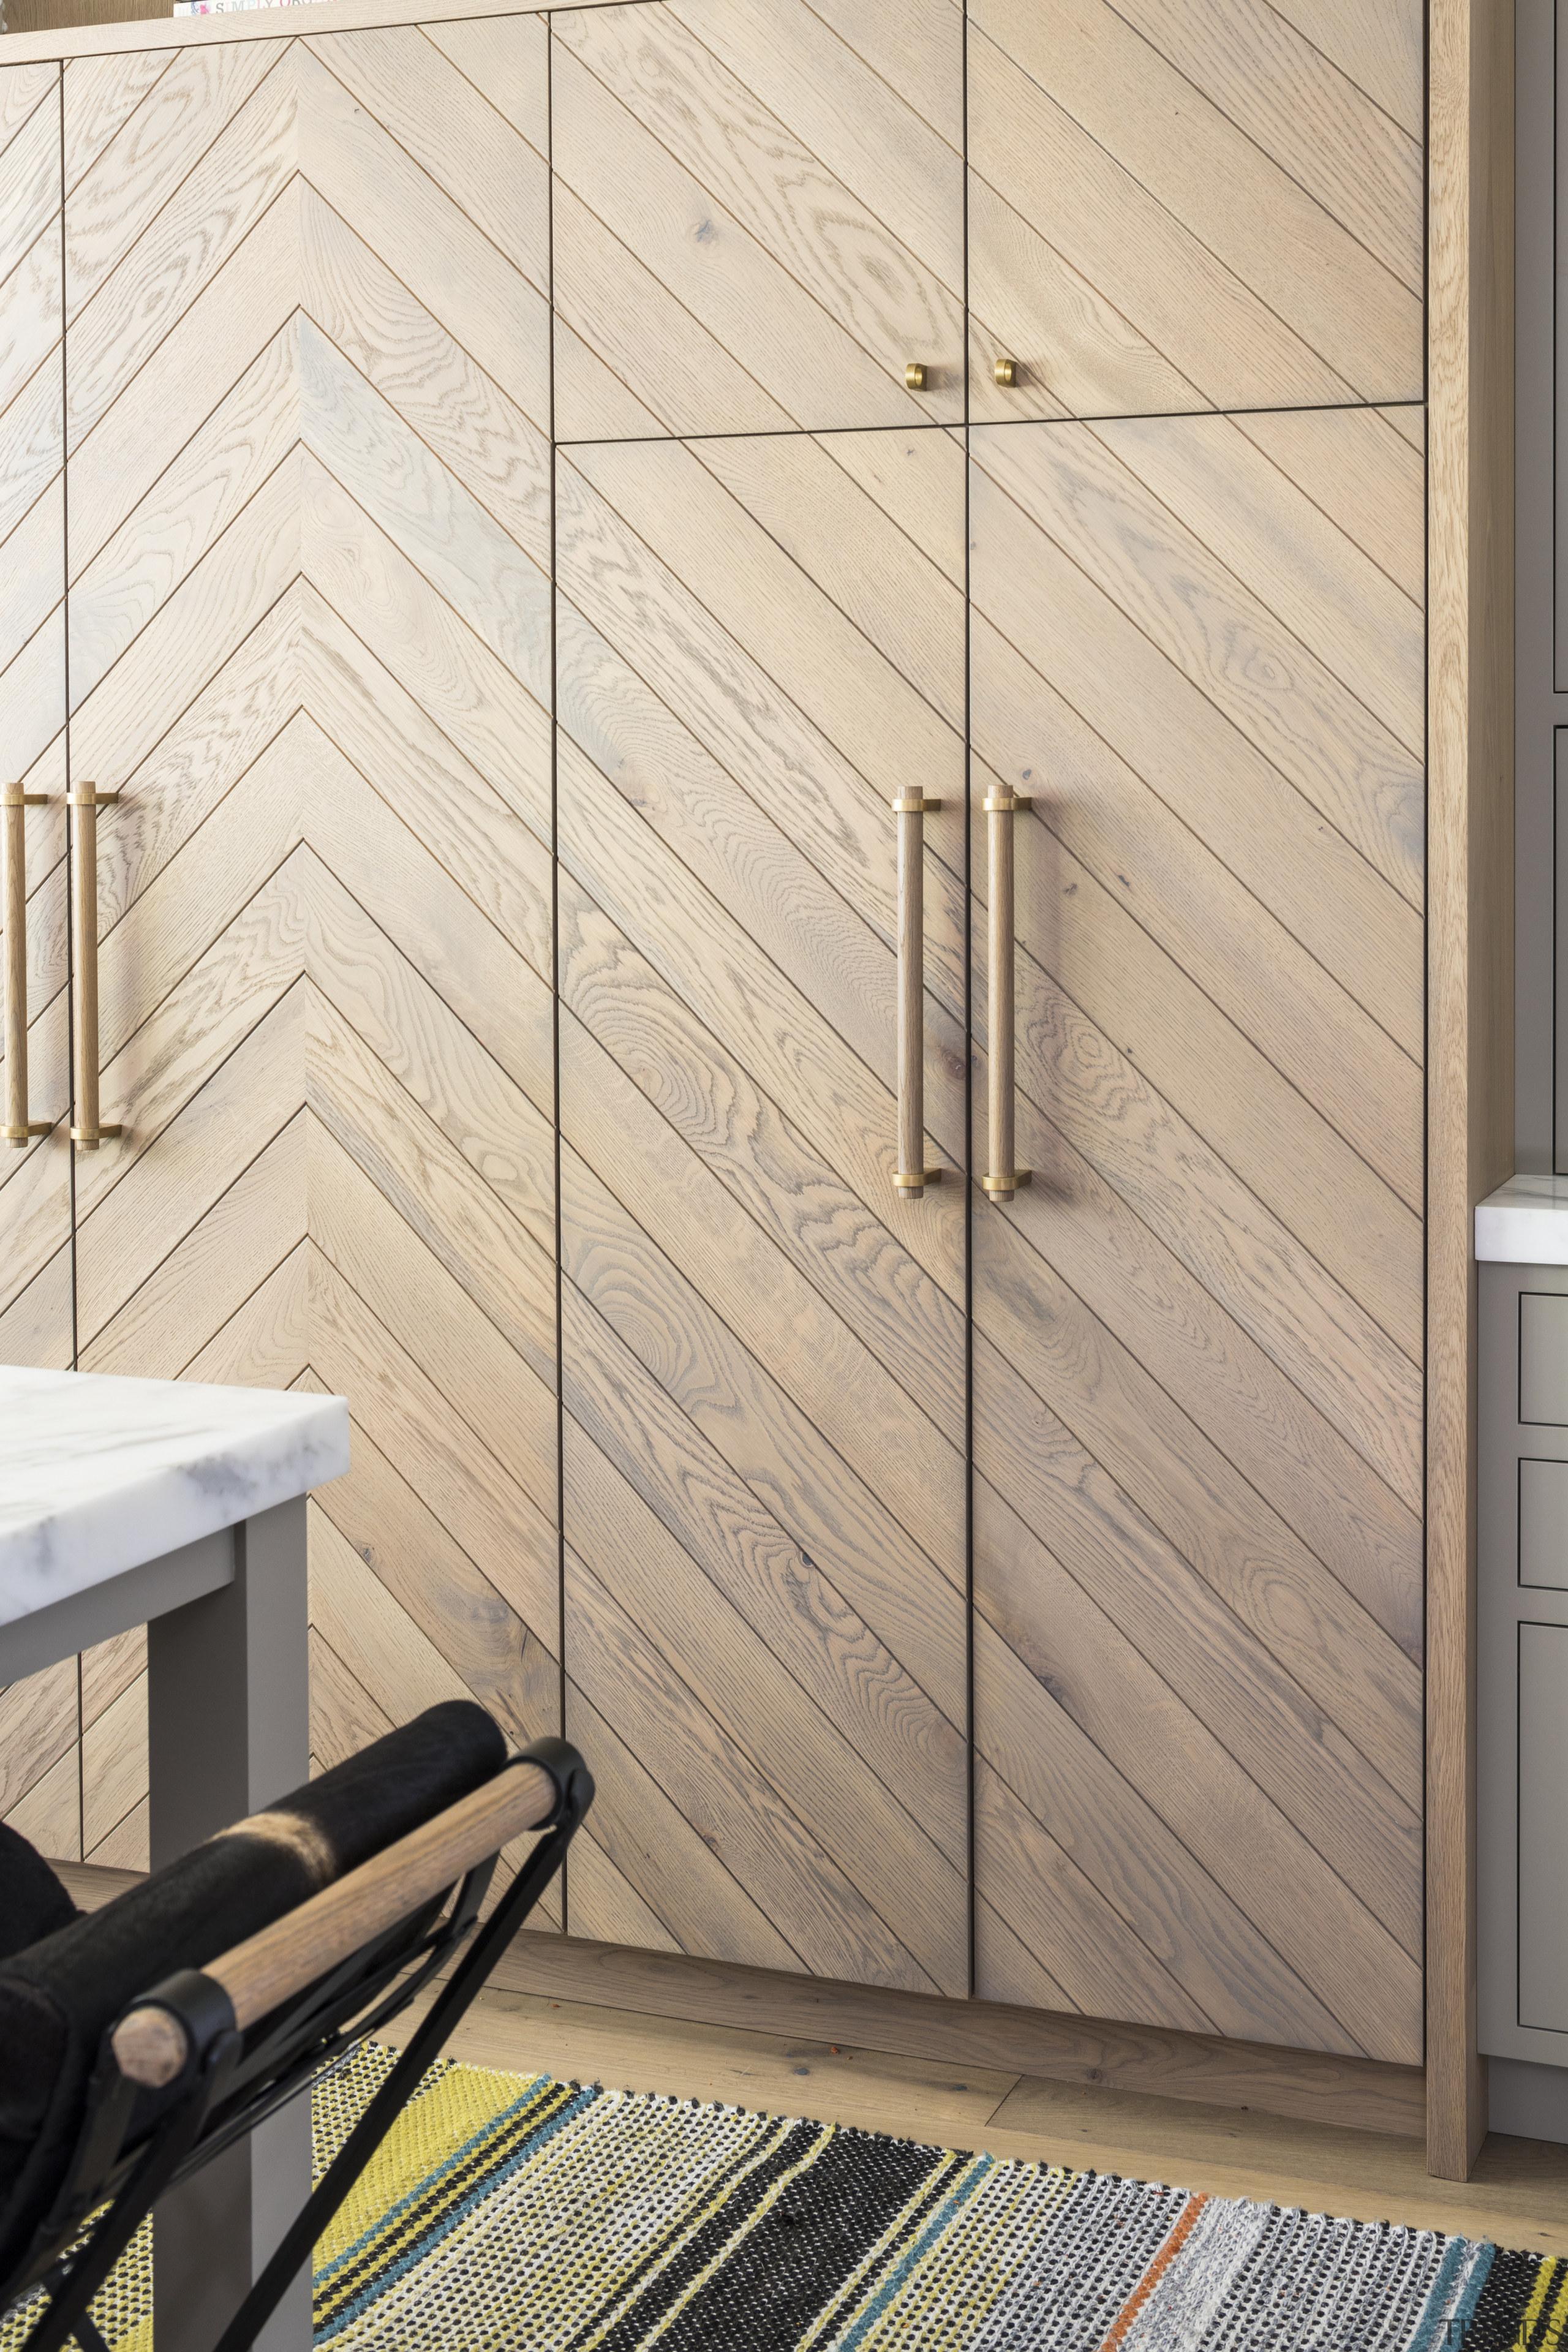 Oak and brass – aged-look brass handles complement